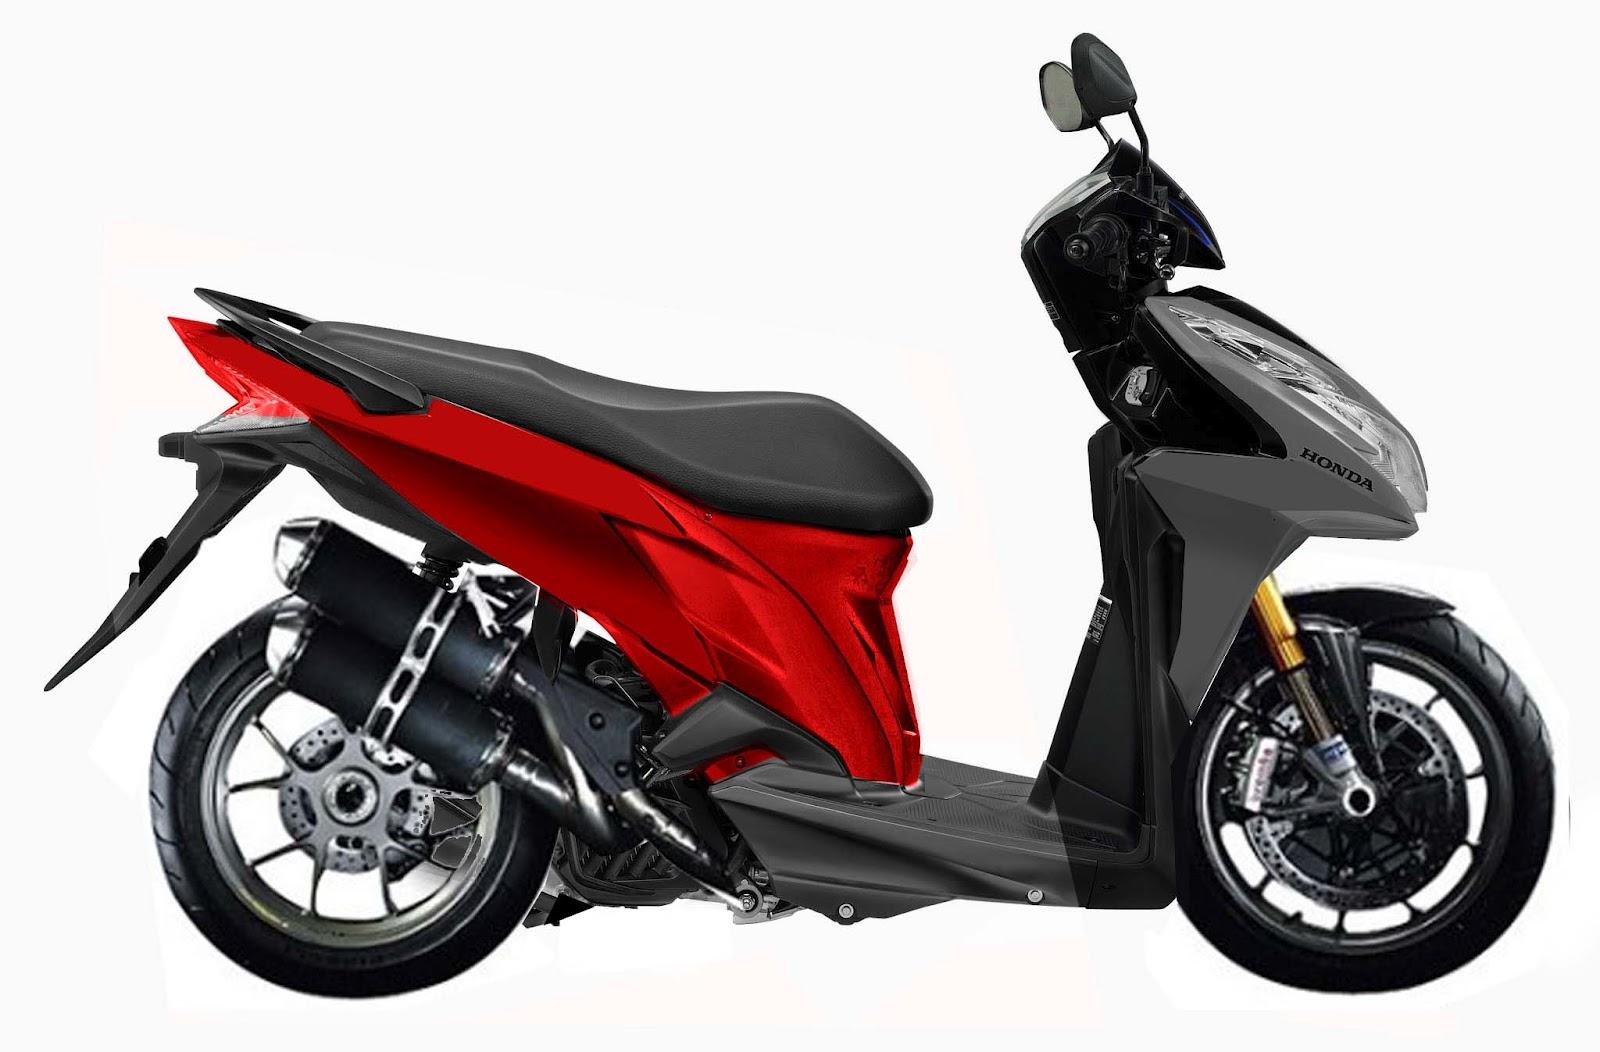 Honda Vario CW 110 FI - Dealer Sepeda Motor Honda